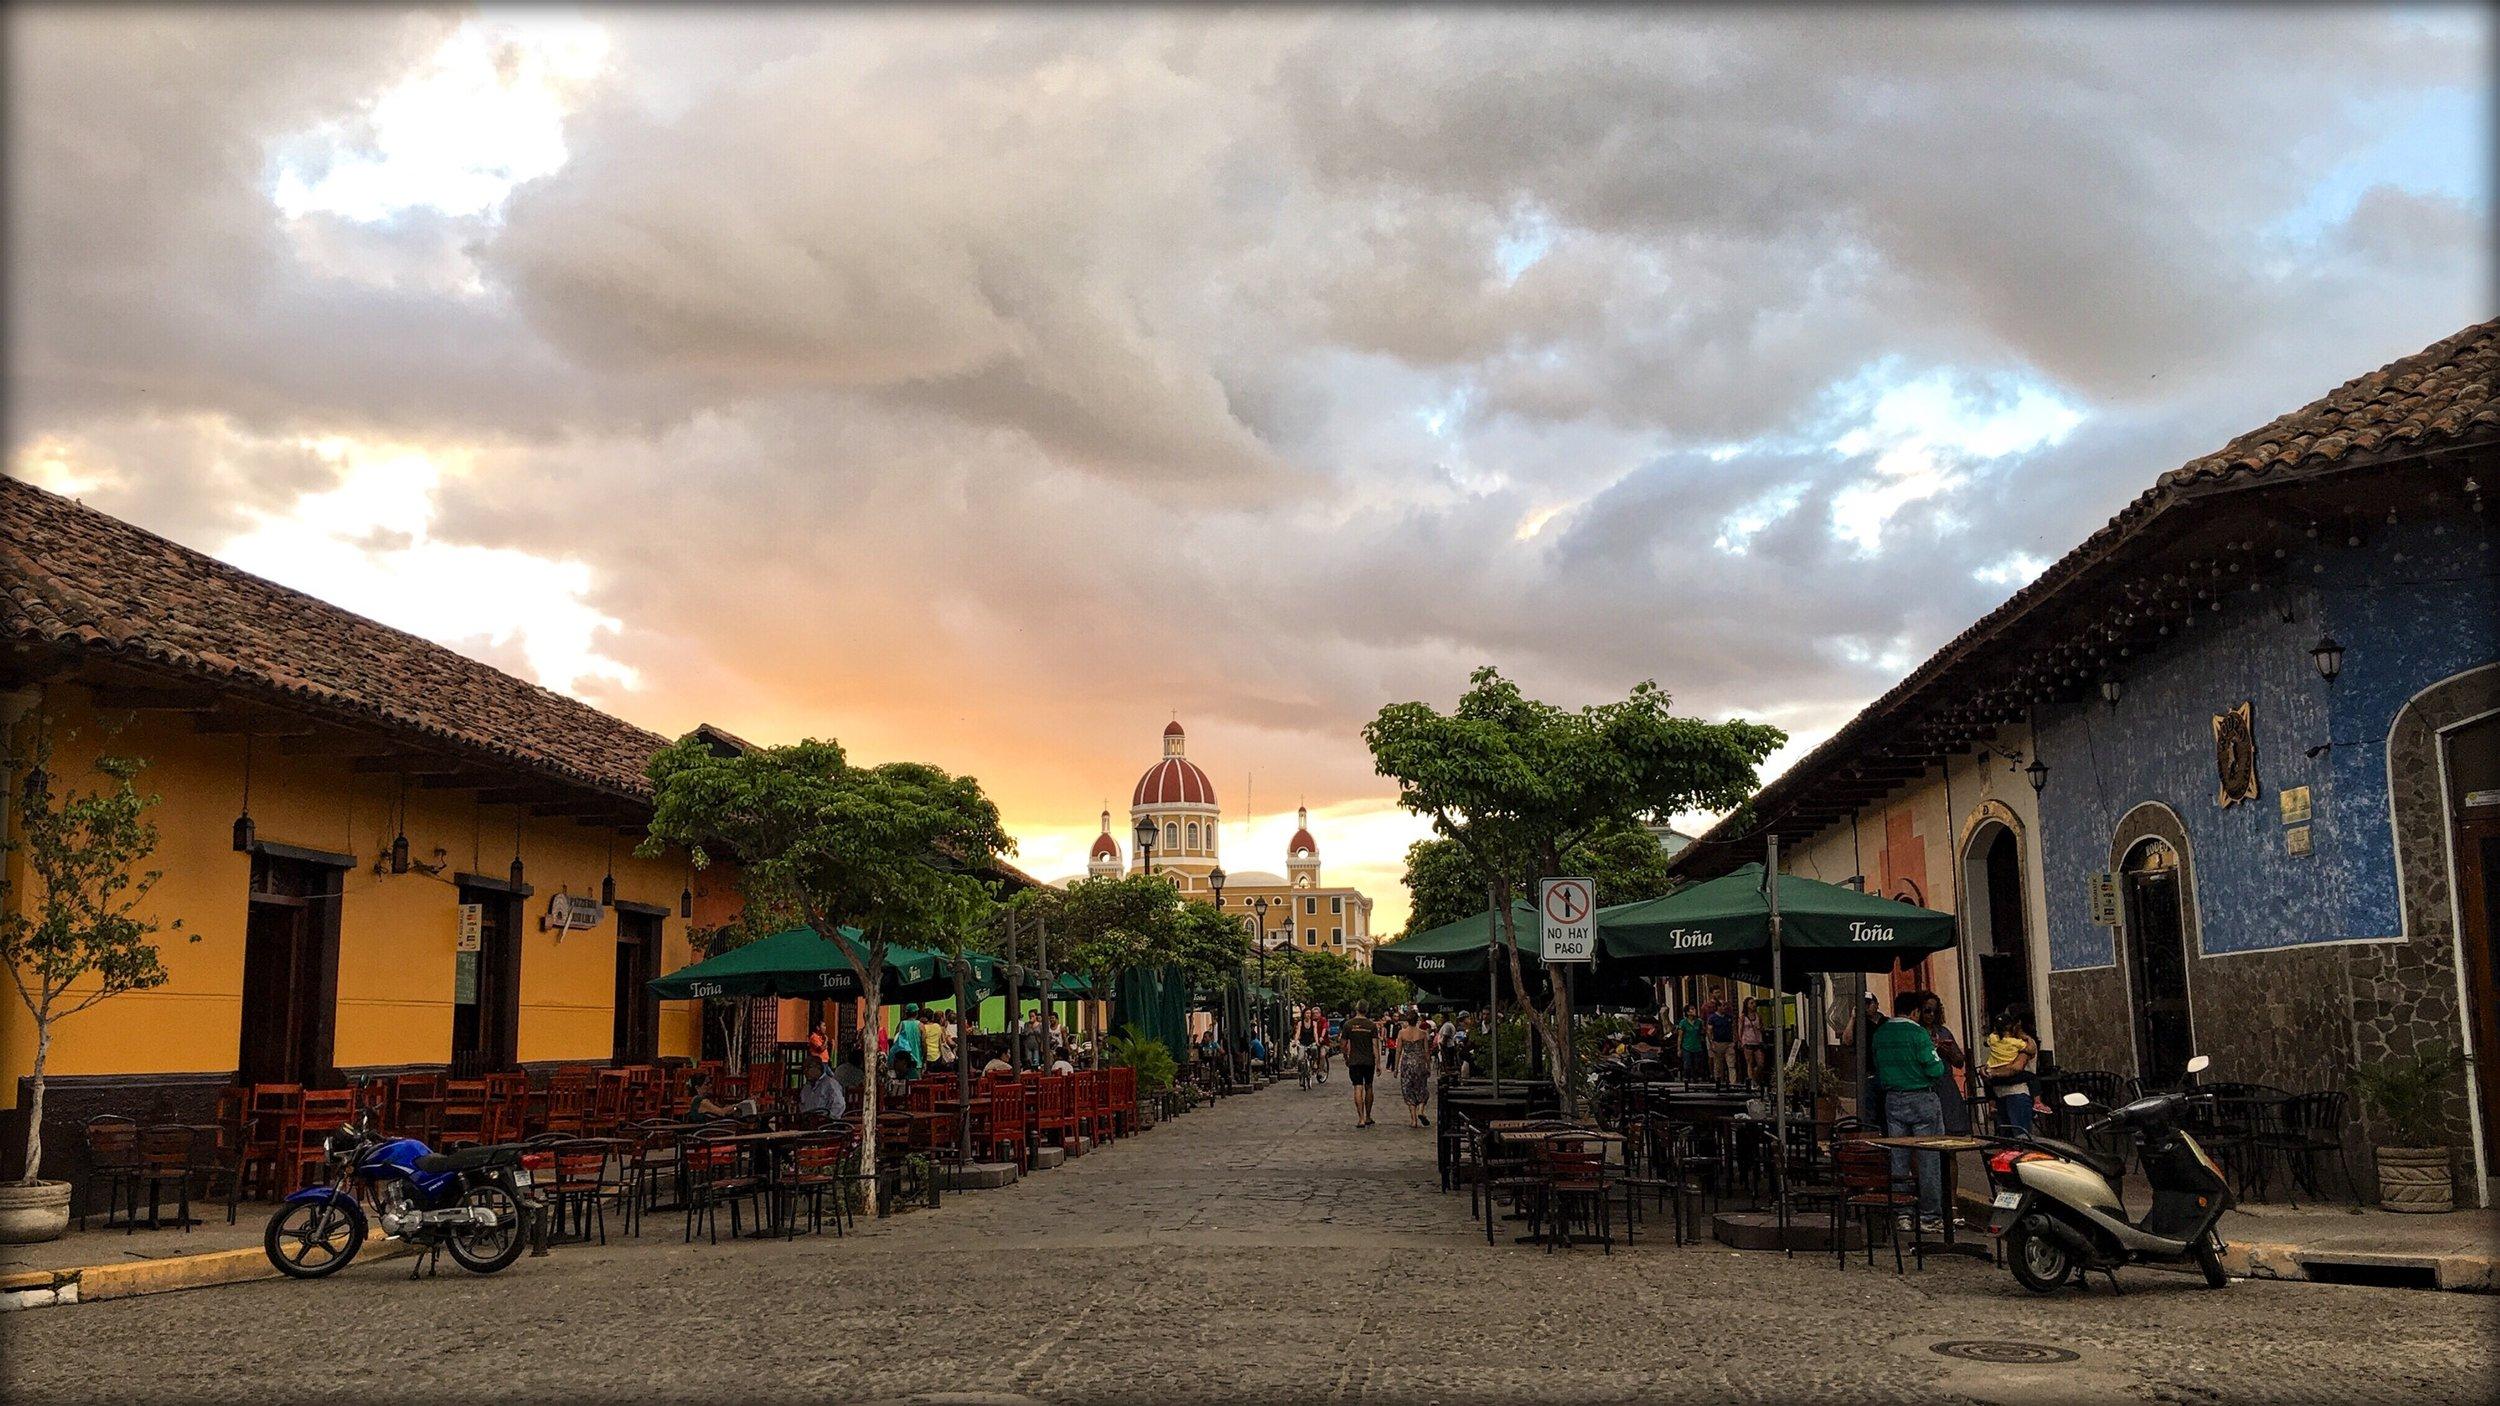 Lunch on Calle La Calzada in Granada, Nicaragua